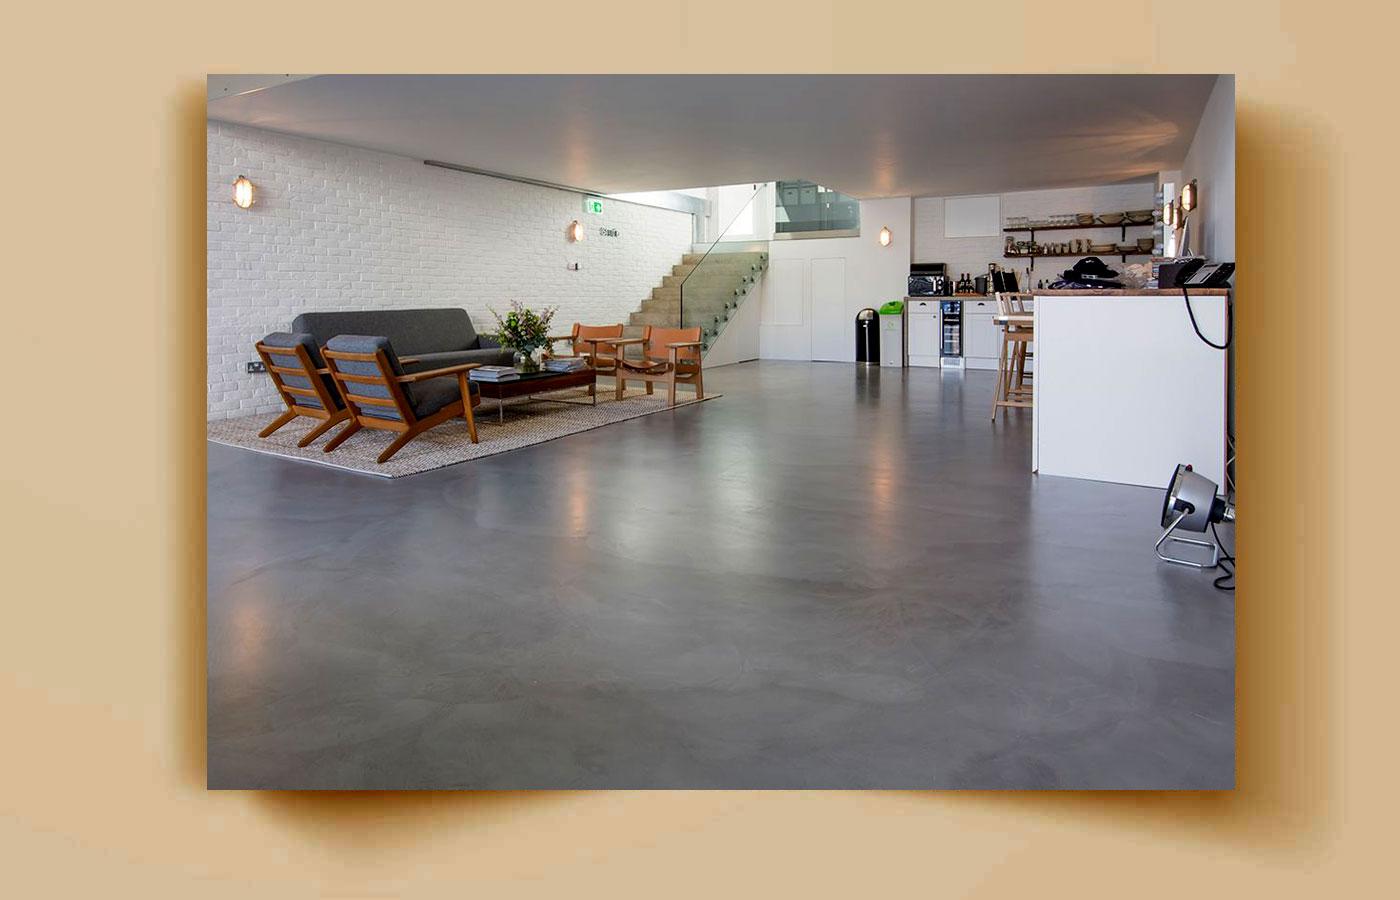 Floor Covering 060 - کف و کف پوش در طراحی داخلی